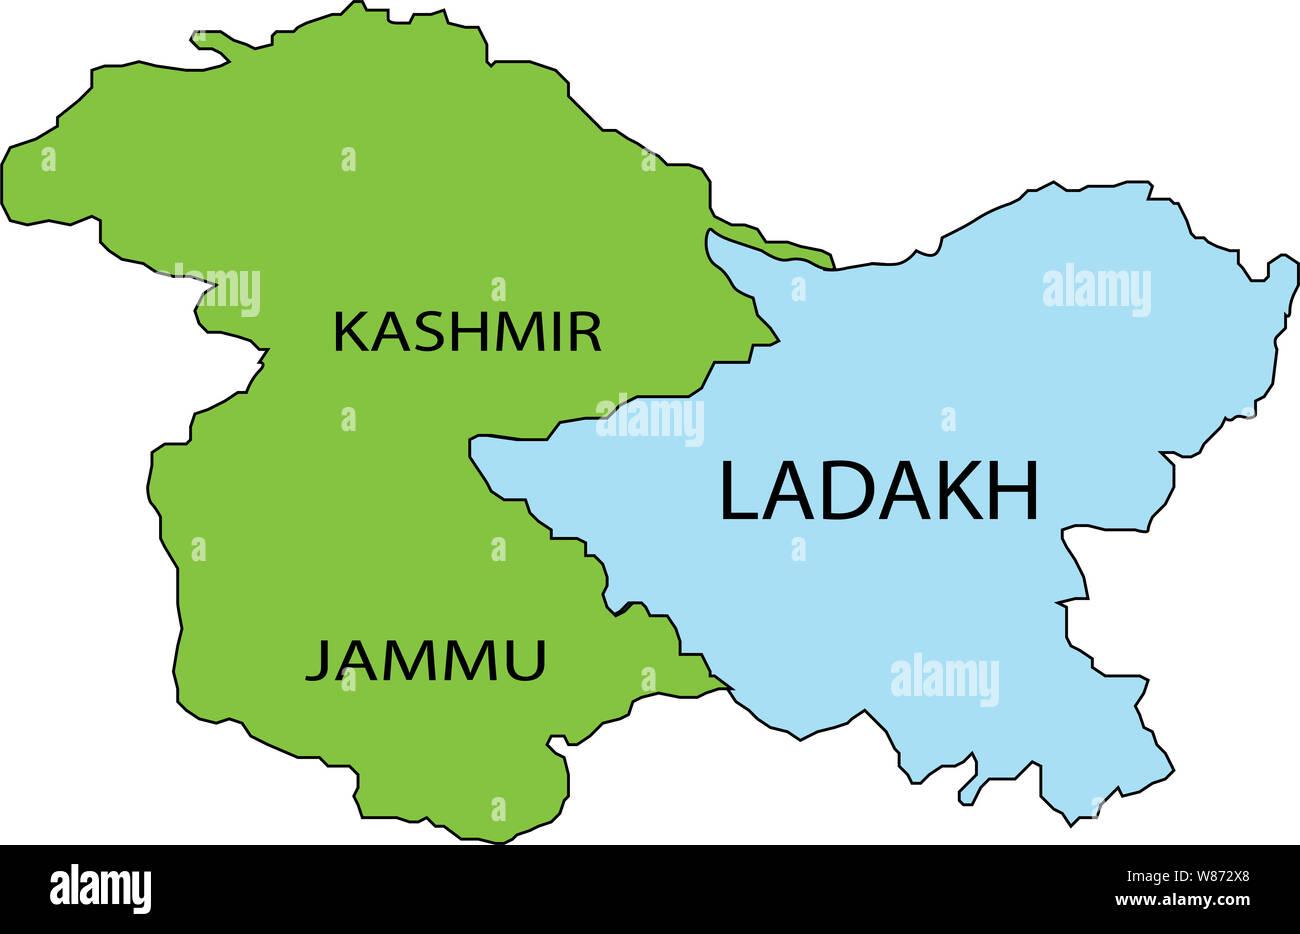 Kashmir Map Stock Photos & Kashmir Map Stock Images - Alamy on aksai chin, kashmir conflict, pune world map, kashmir valley, kathmandu world map, azad kashmir, rwanda world map, thank you world map, surat world map, uttar pradesh world map, sumatra world map, kanpur world map, punjab world map, jammu on world map, nagpur world map, ladakh trekking map, patna world map, indus river, golan heights world map, jammu and kashmir, kashmiri people, rome world map, tibet world map, ahmedabad world map, western sahara world map, urdu world map, calcutta world map,